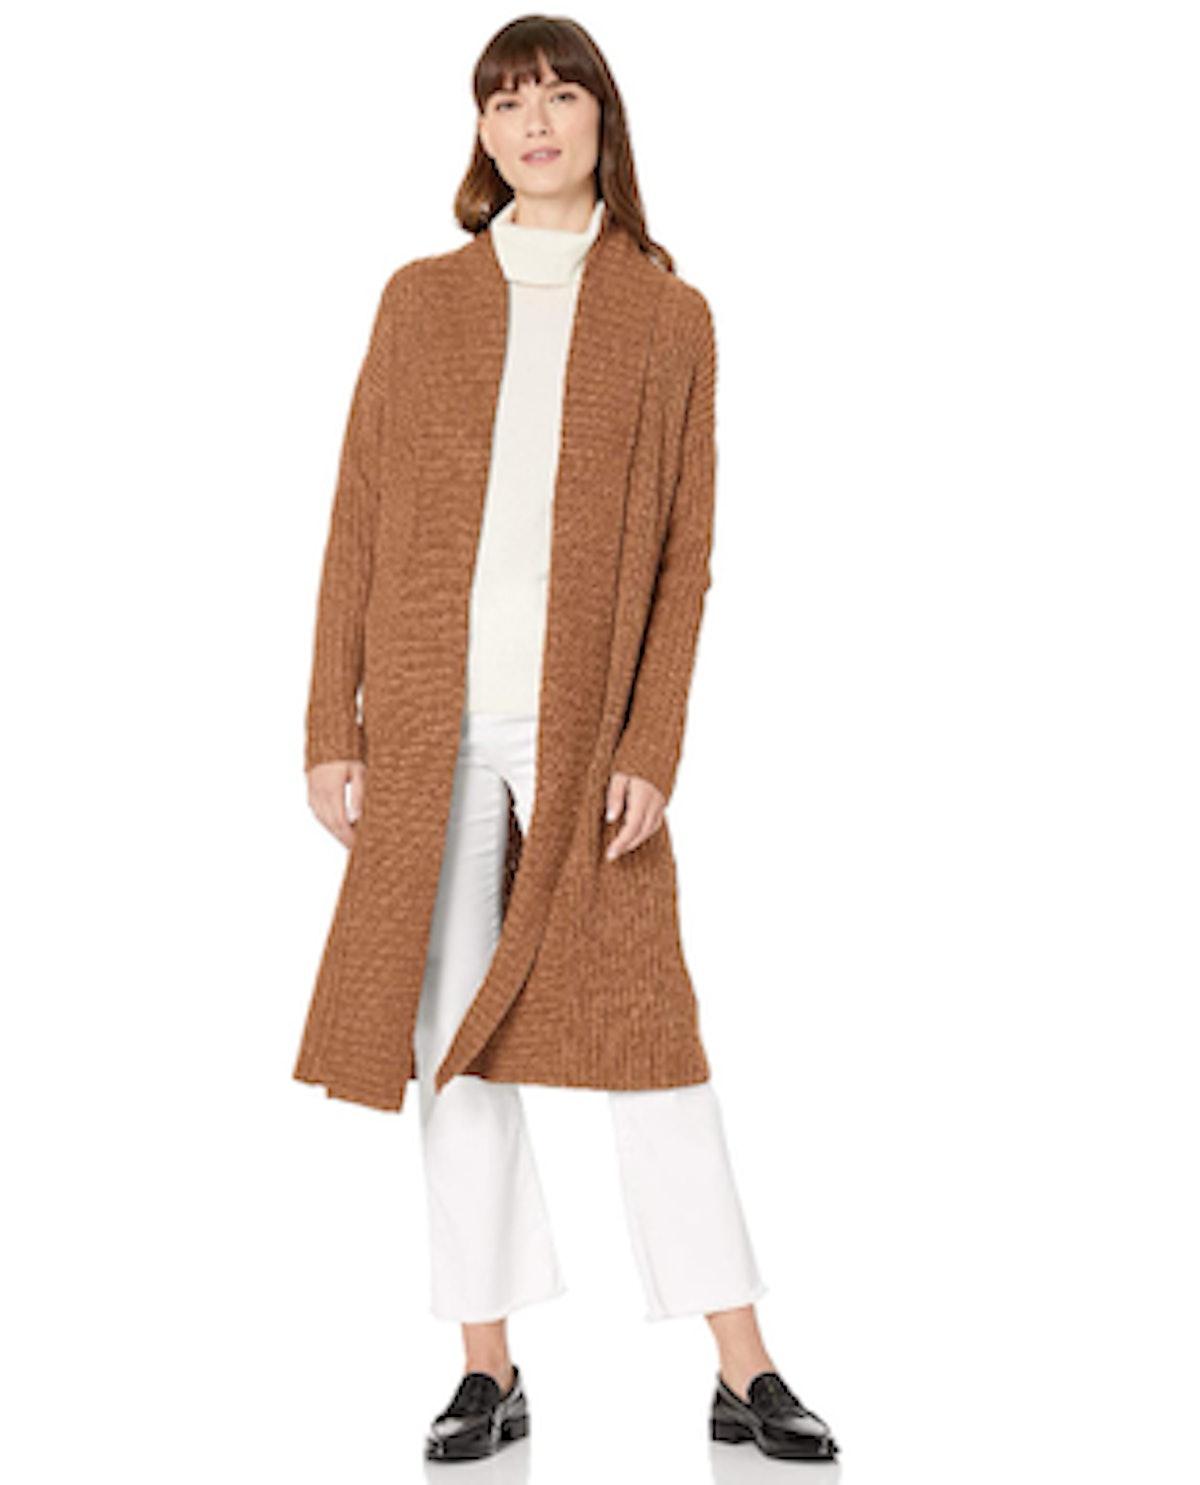 Amazon Essentials Knee-Length Sweater